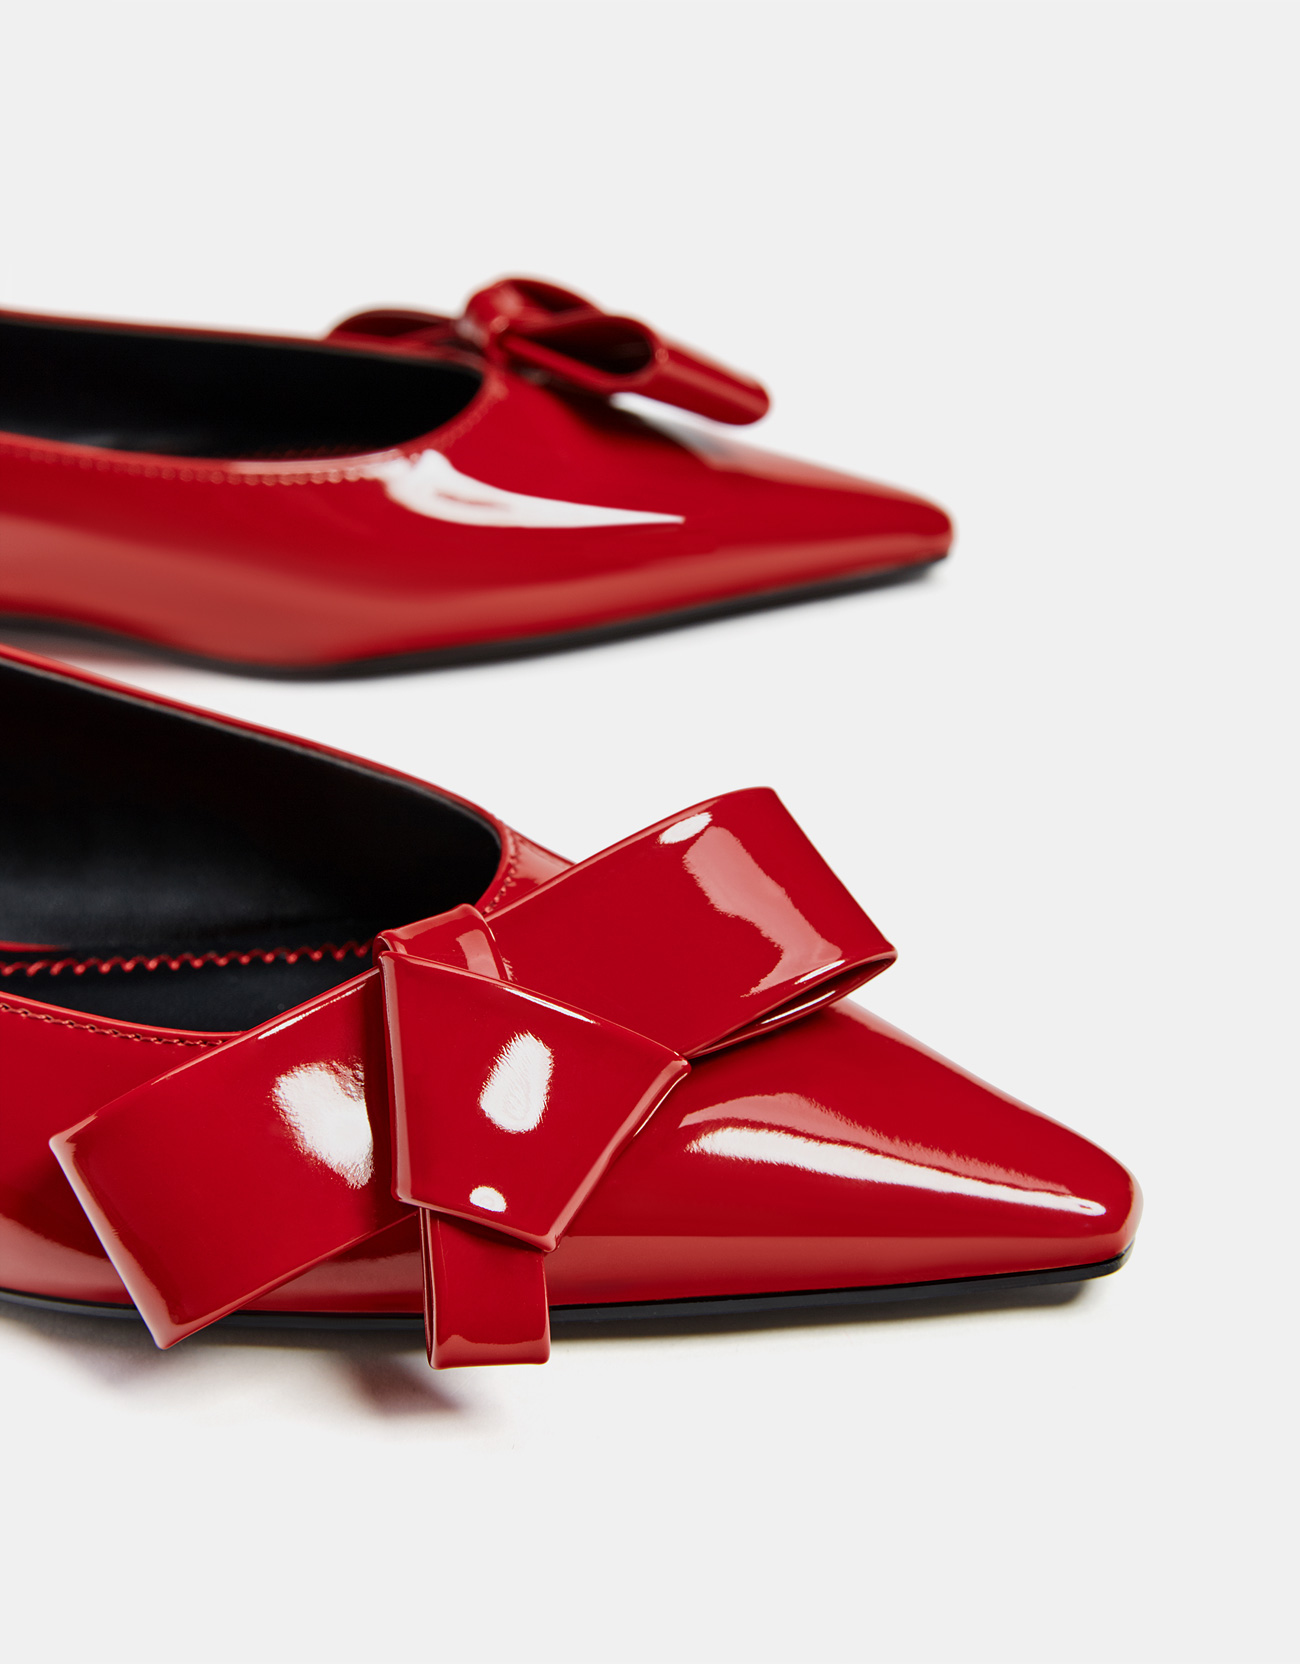 b9c913722 Faux patent leather ballerinas with bow - Flats - Bershka Macedonia